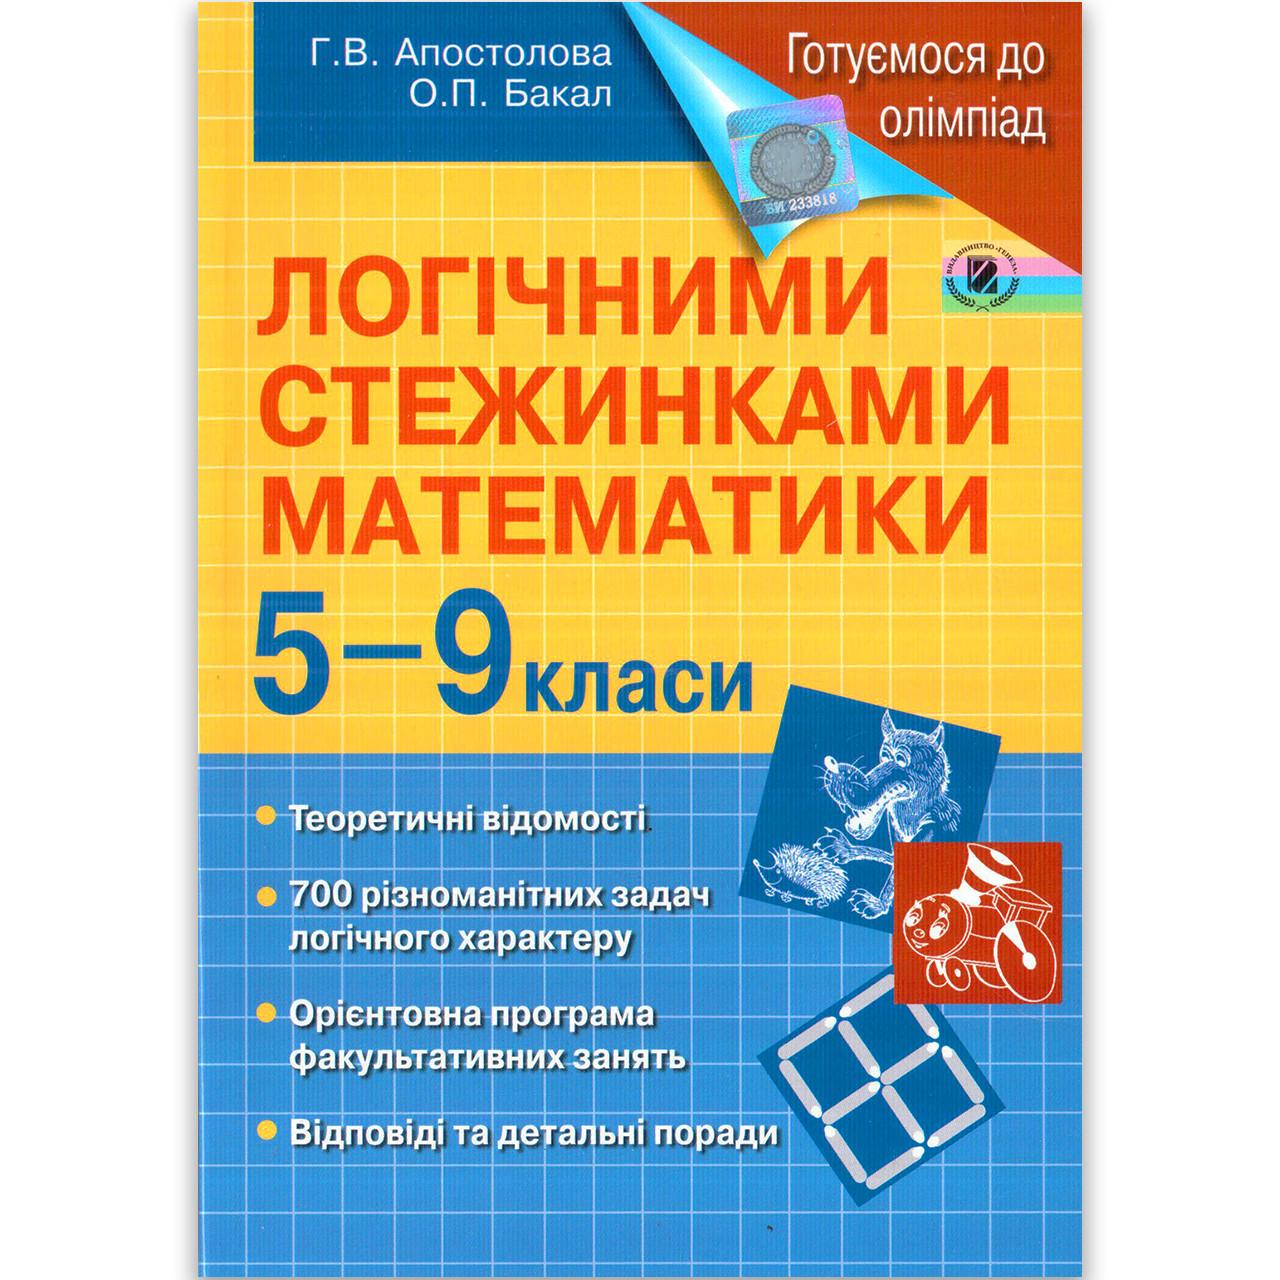 Логічними стежинками математики 5-9 класи Авт: Апостолова Г. Вид: Генеза